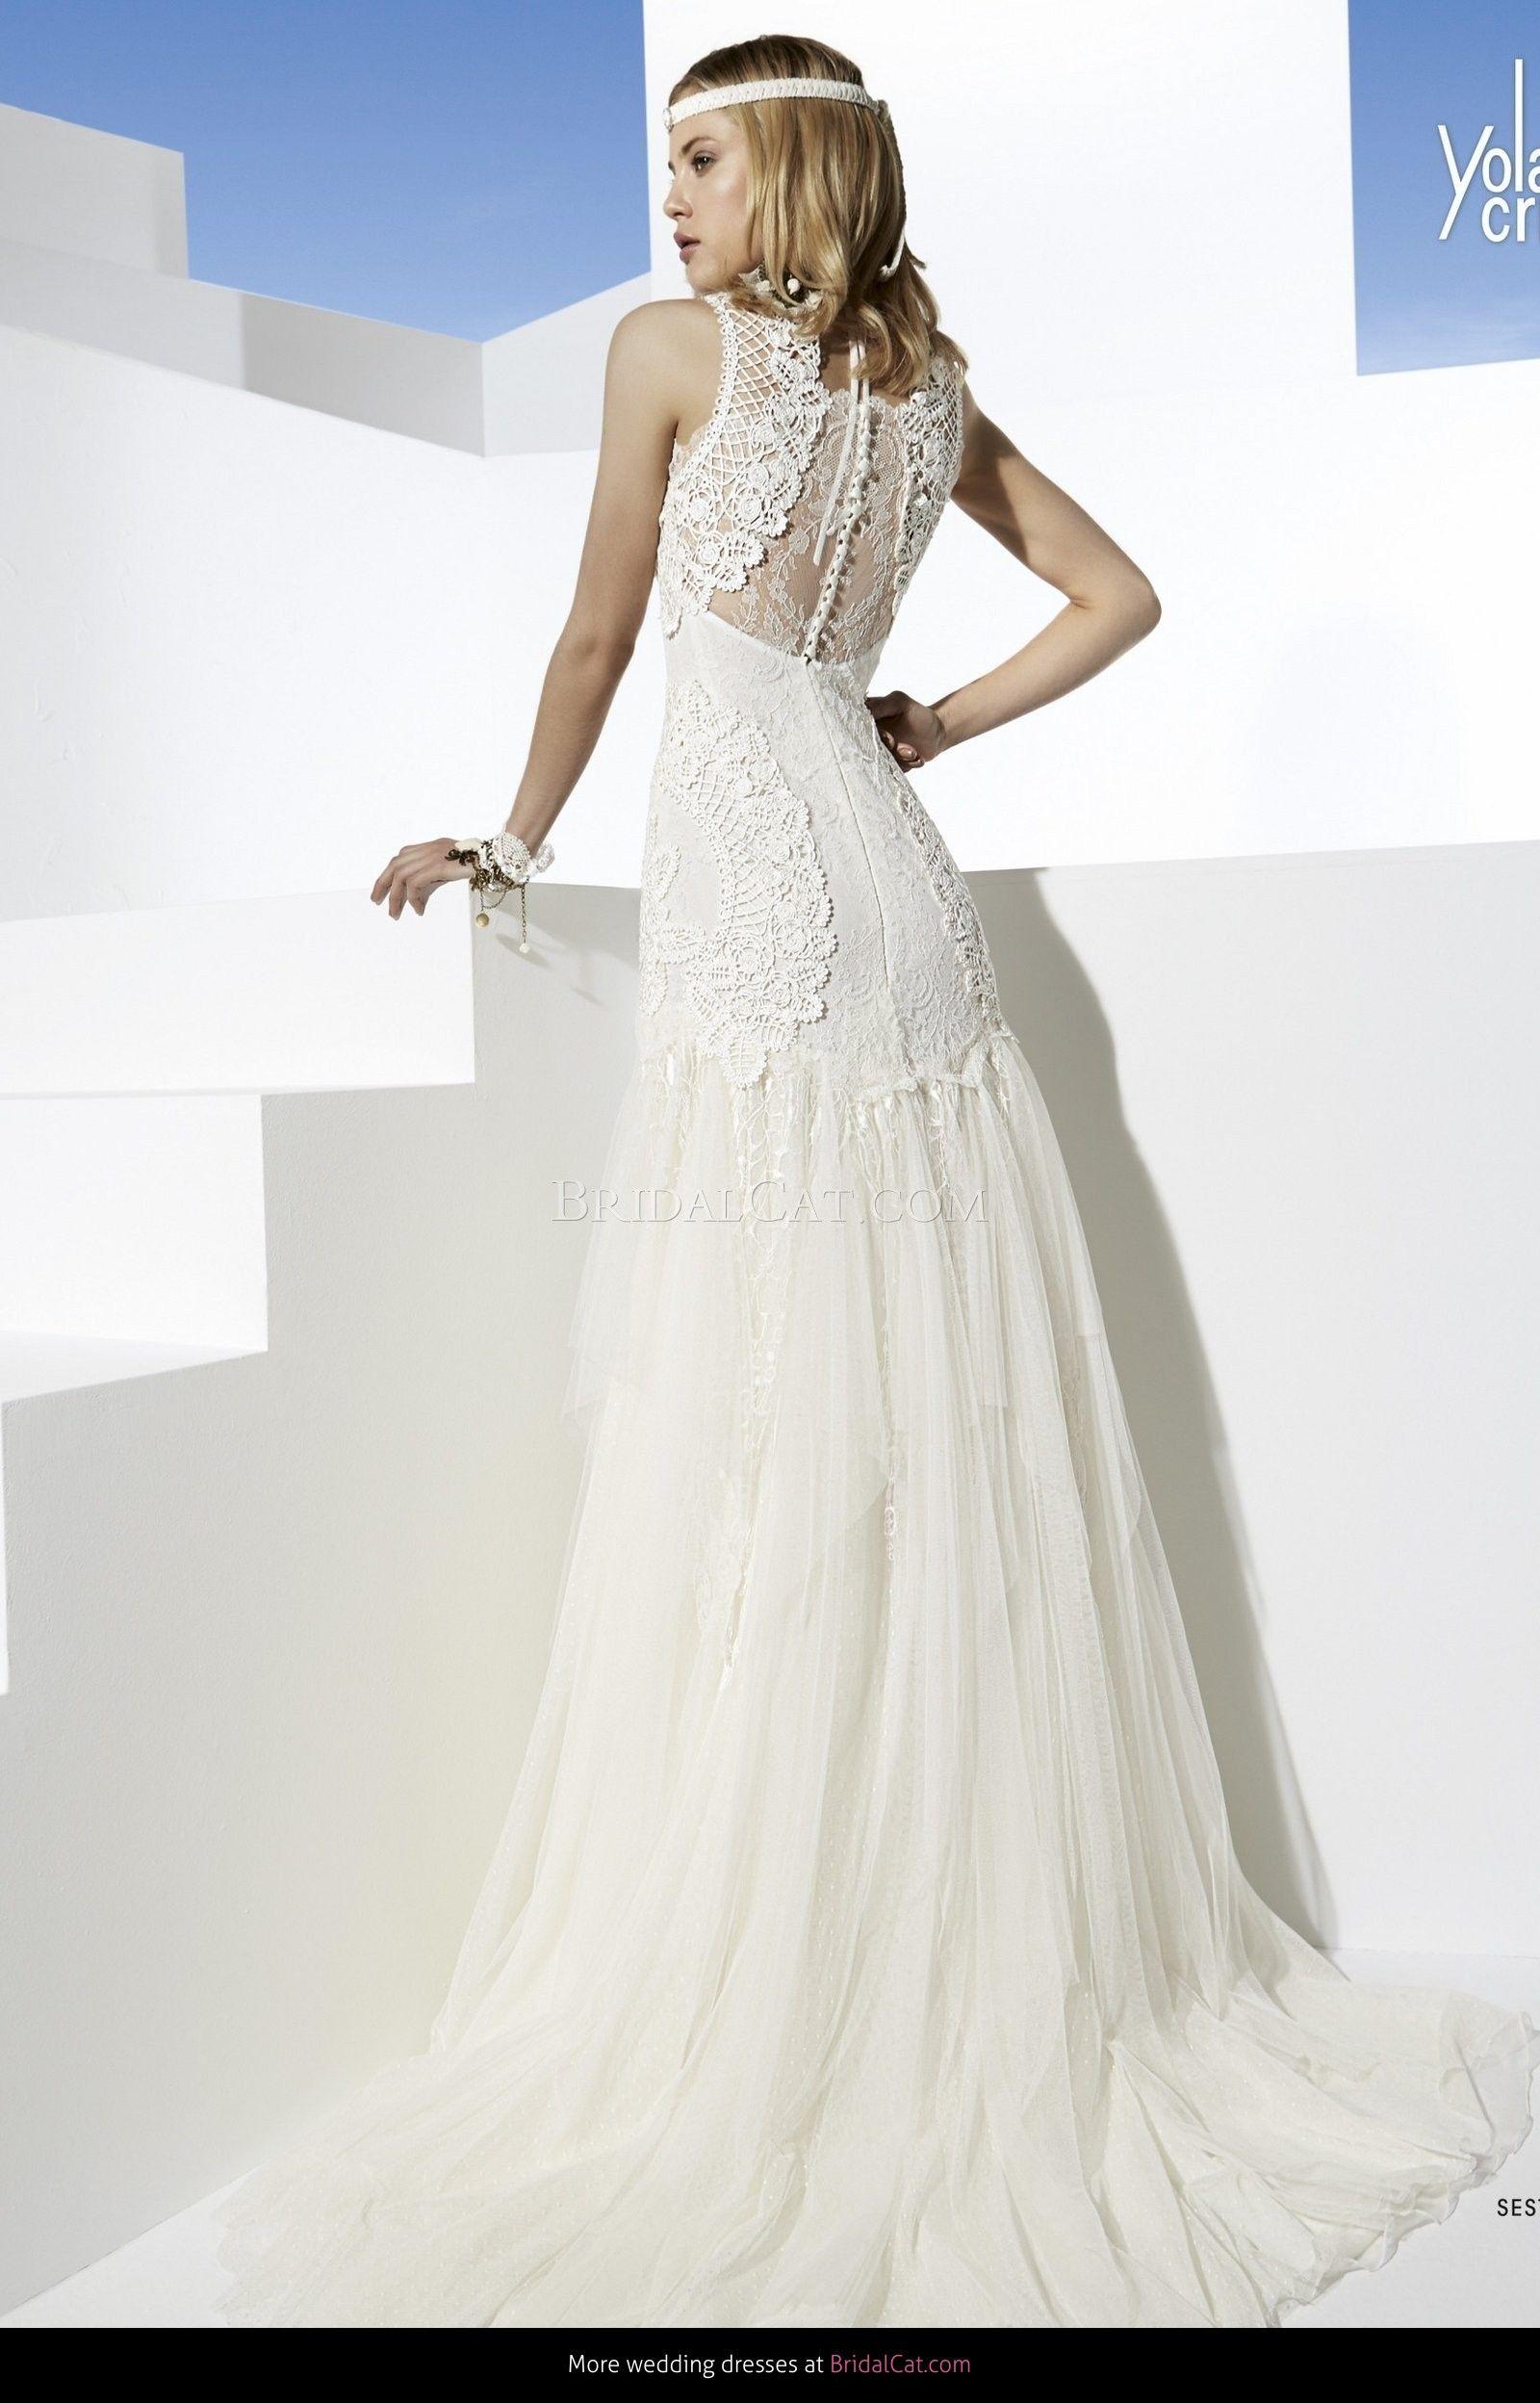 YolanCris - Sestao - Boho Girl | Wedding Dress | Pinterest ...